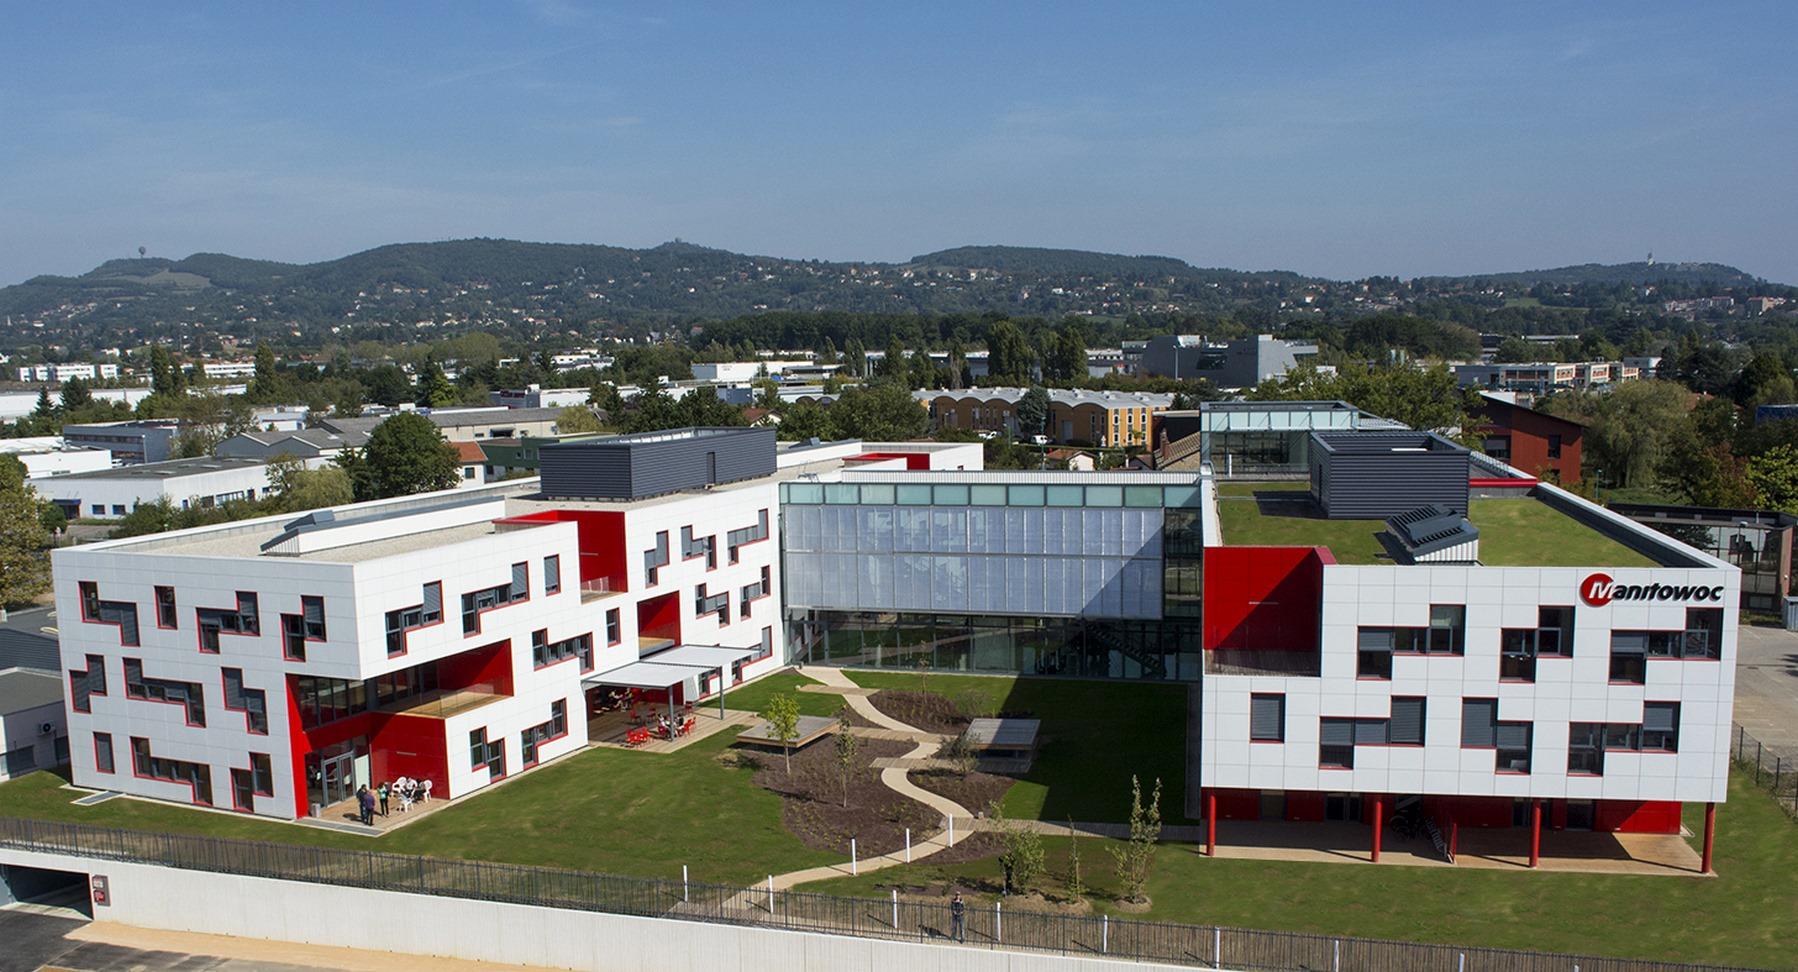 Siège Manitowoc - Dardilly : vue aérienne - Z Architecture